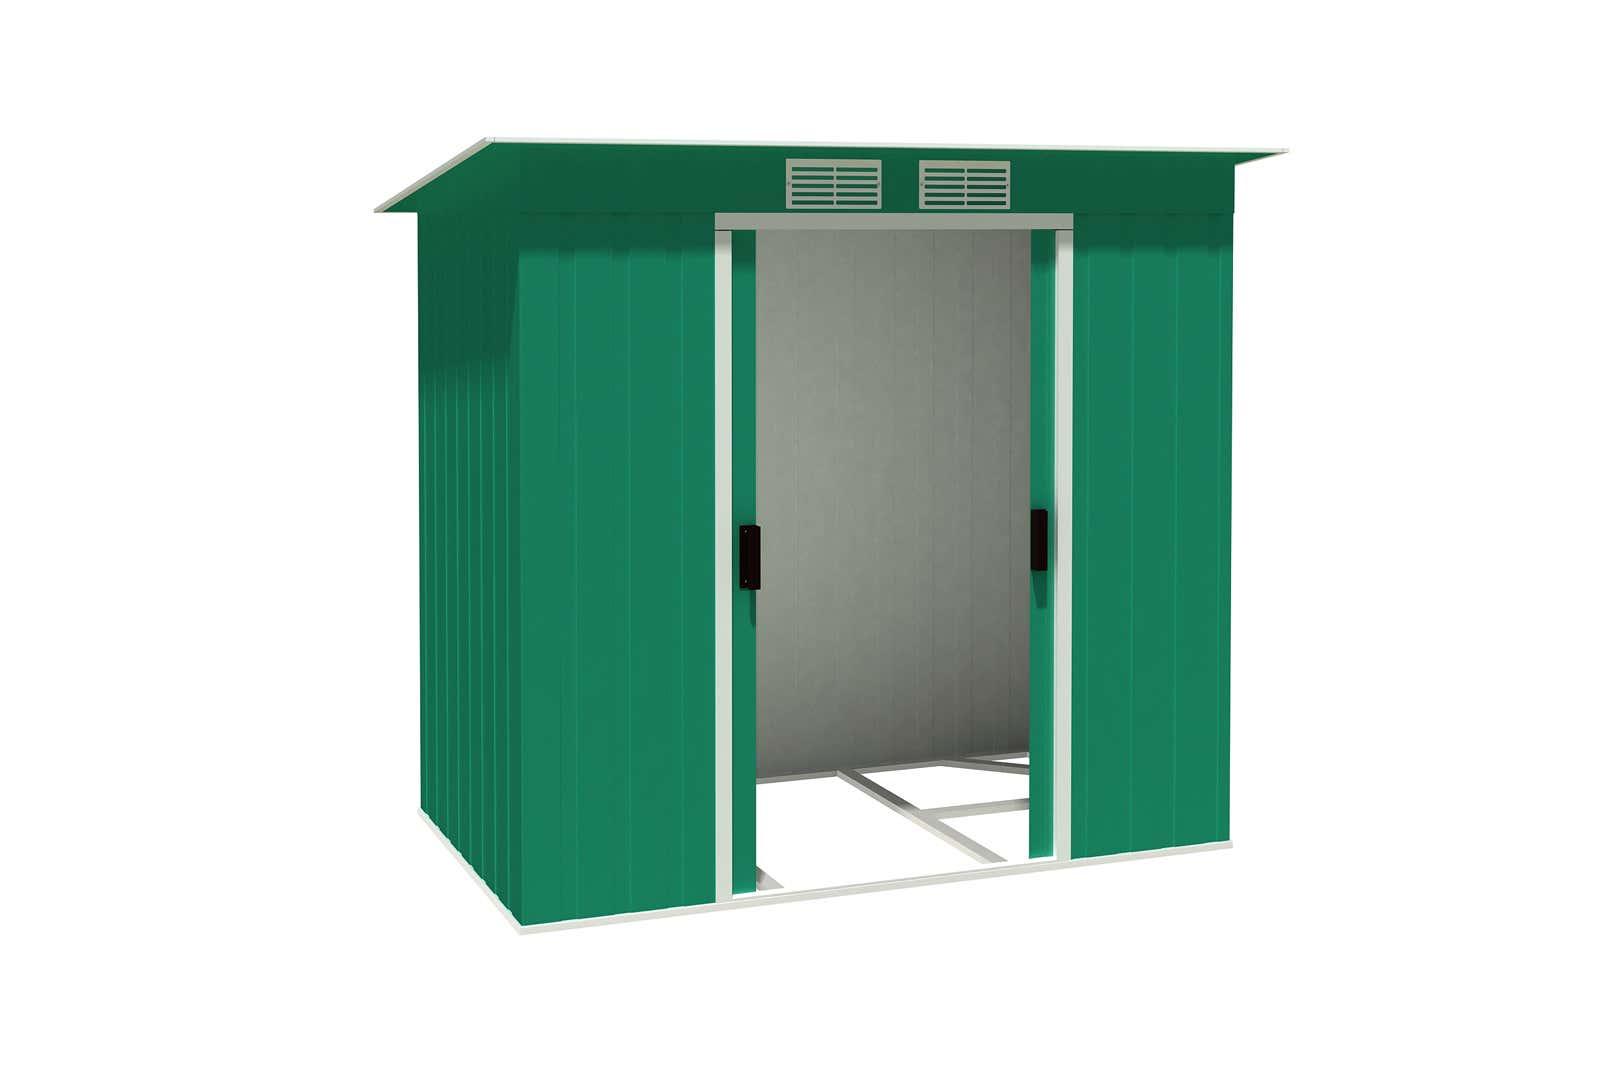 metallger tehaus pent roof 6x4 gr n 7116 a z gartenhaus gmbh. Black Bedroom Furniture Sets. Home Design Ideas